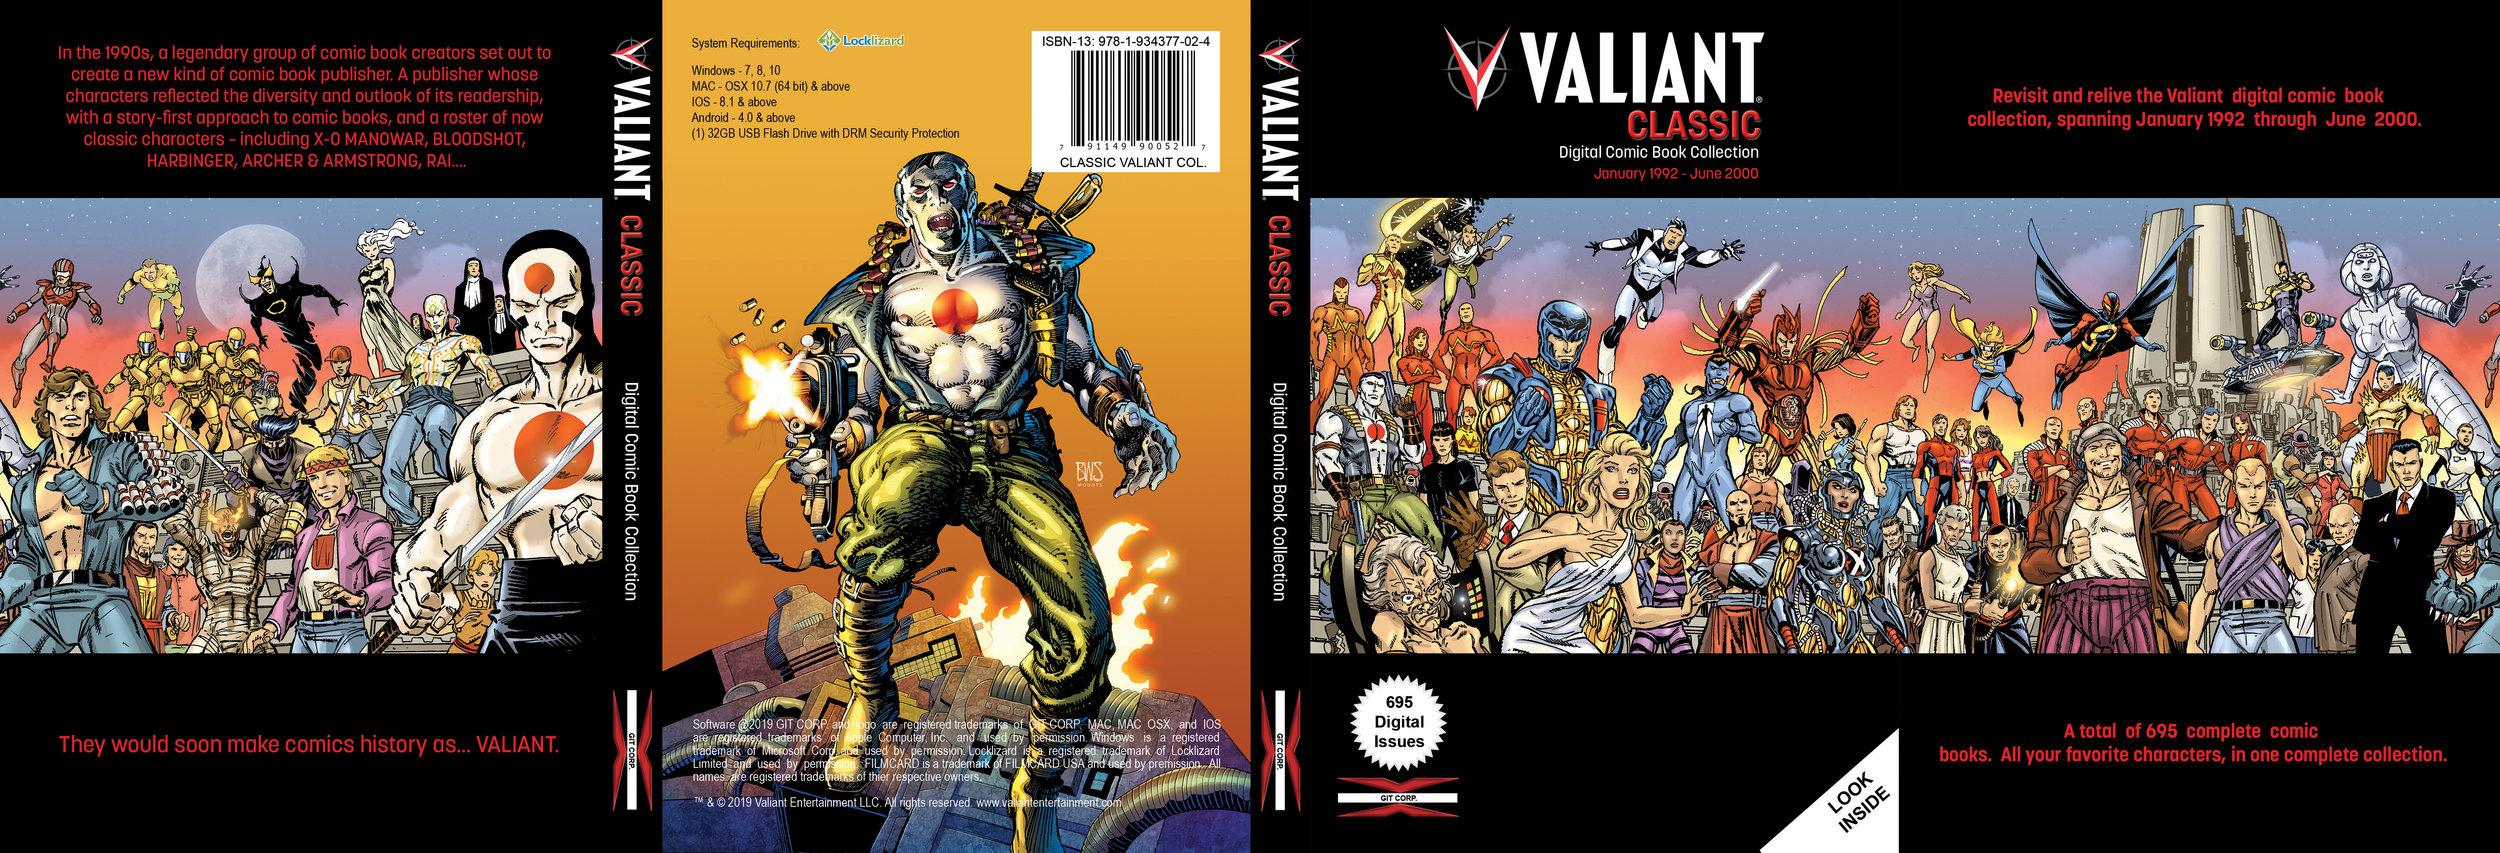 Valiant_Classic_Flat Box Art.jpg